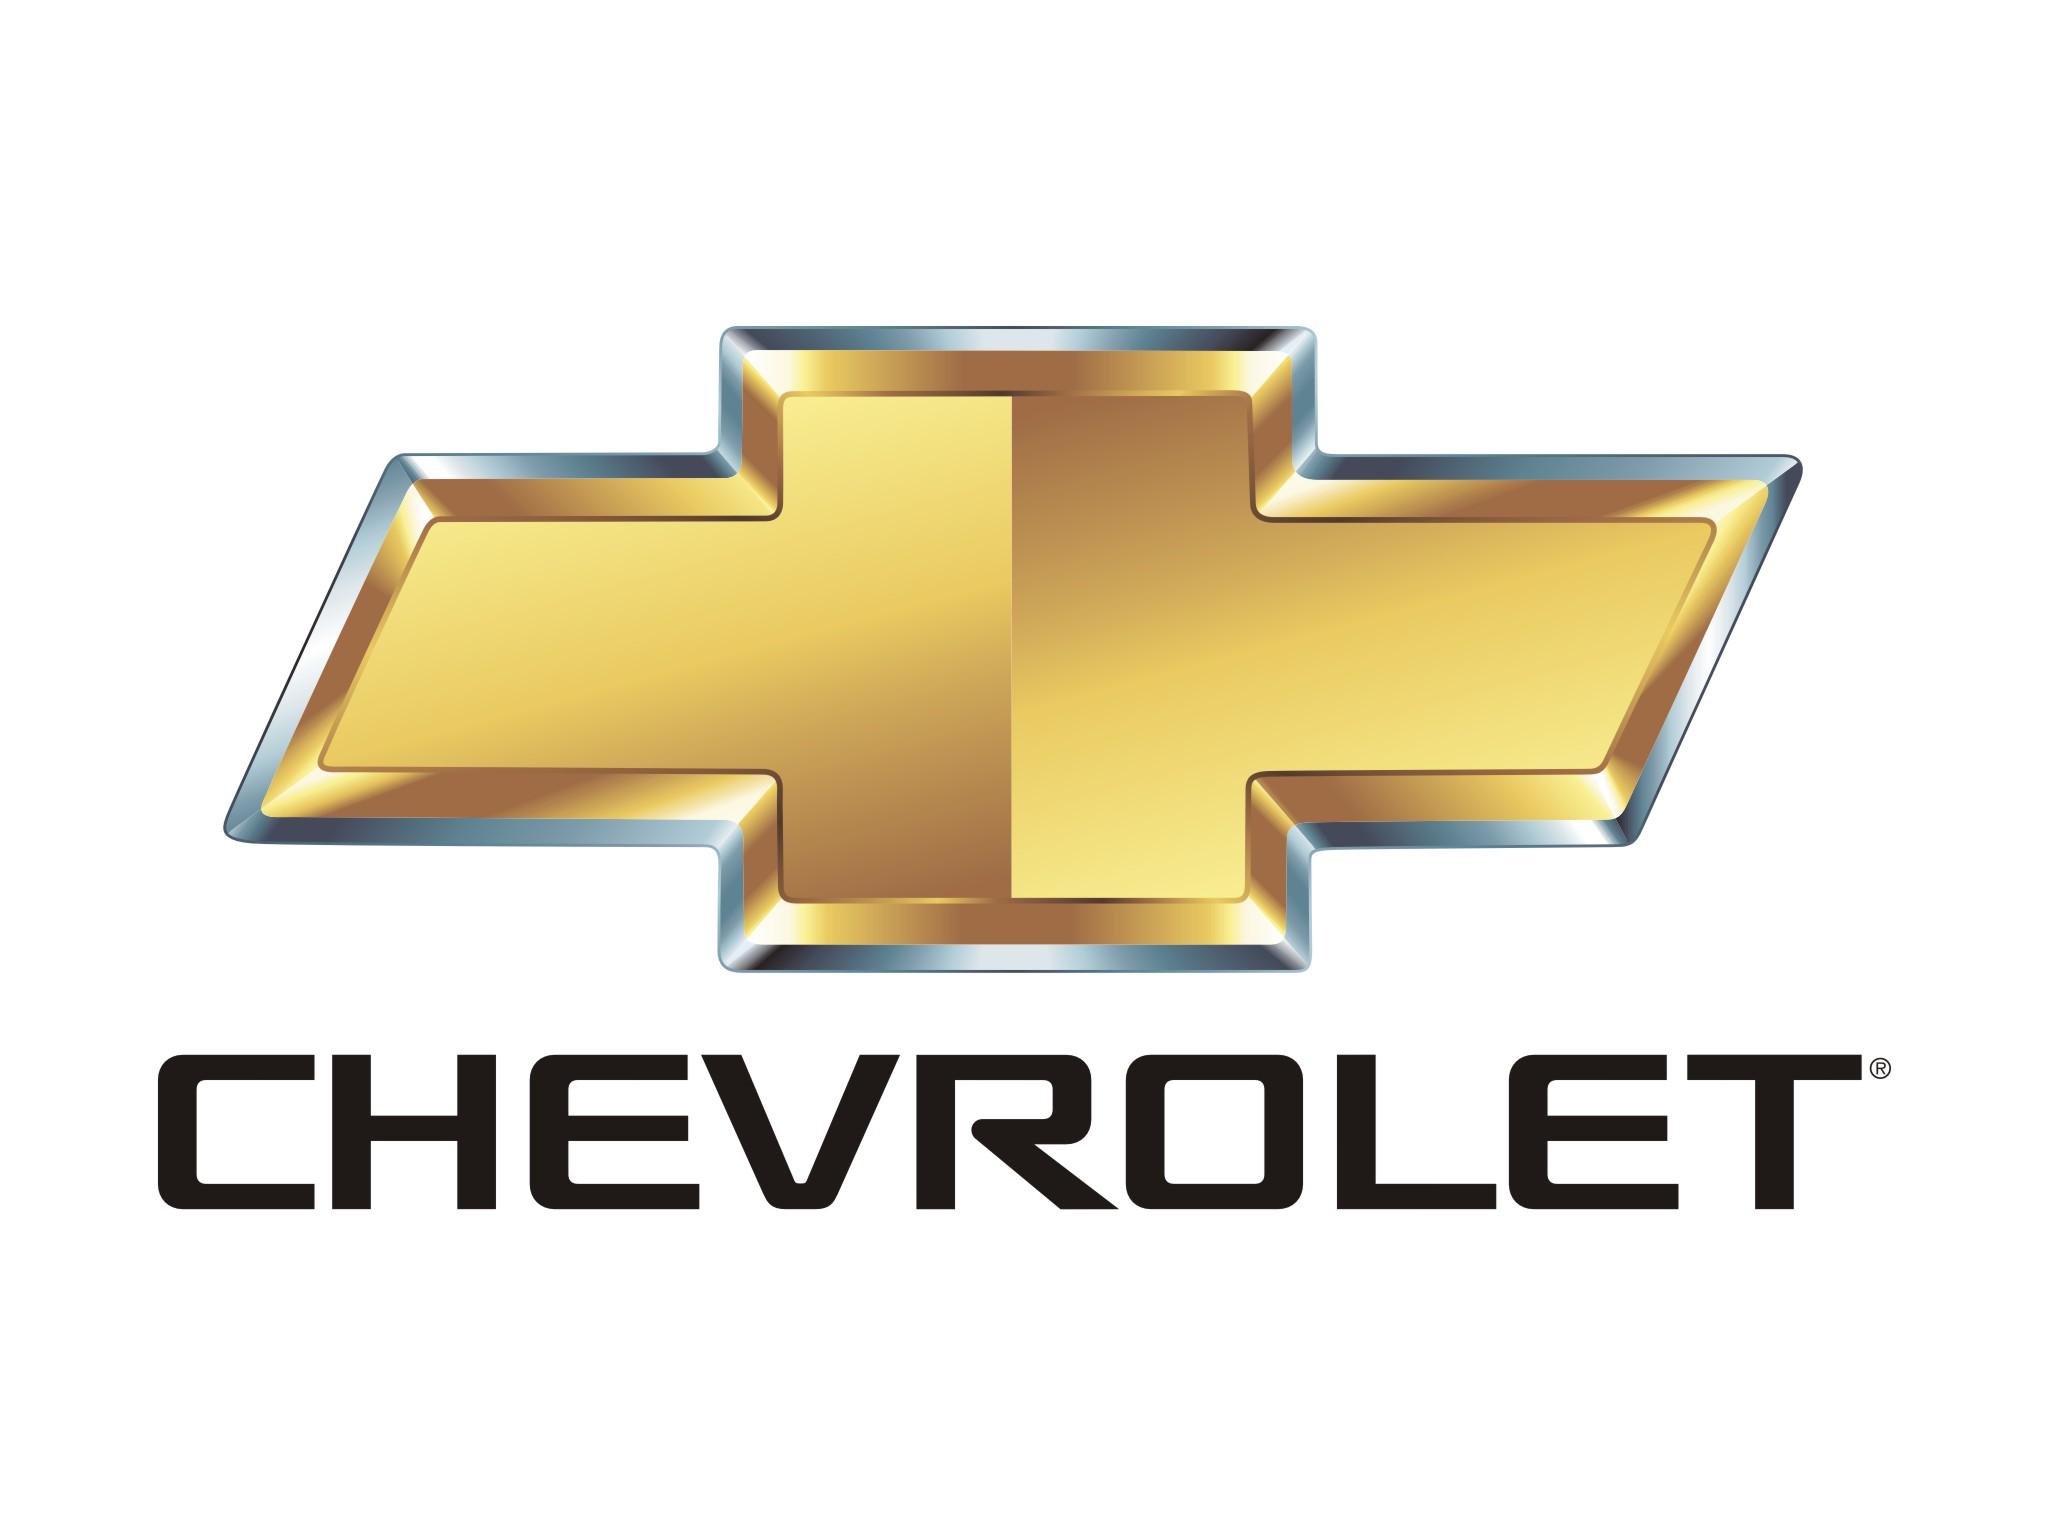 chevy logo wallpaper hd2 - photo #15